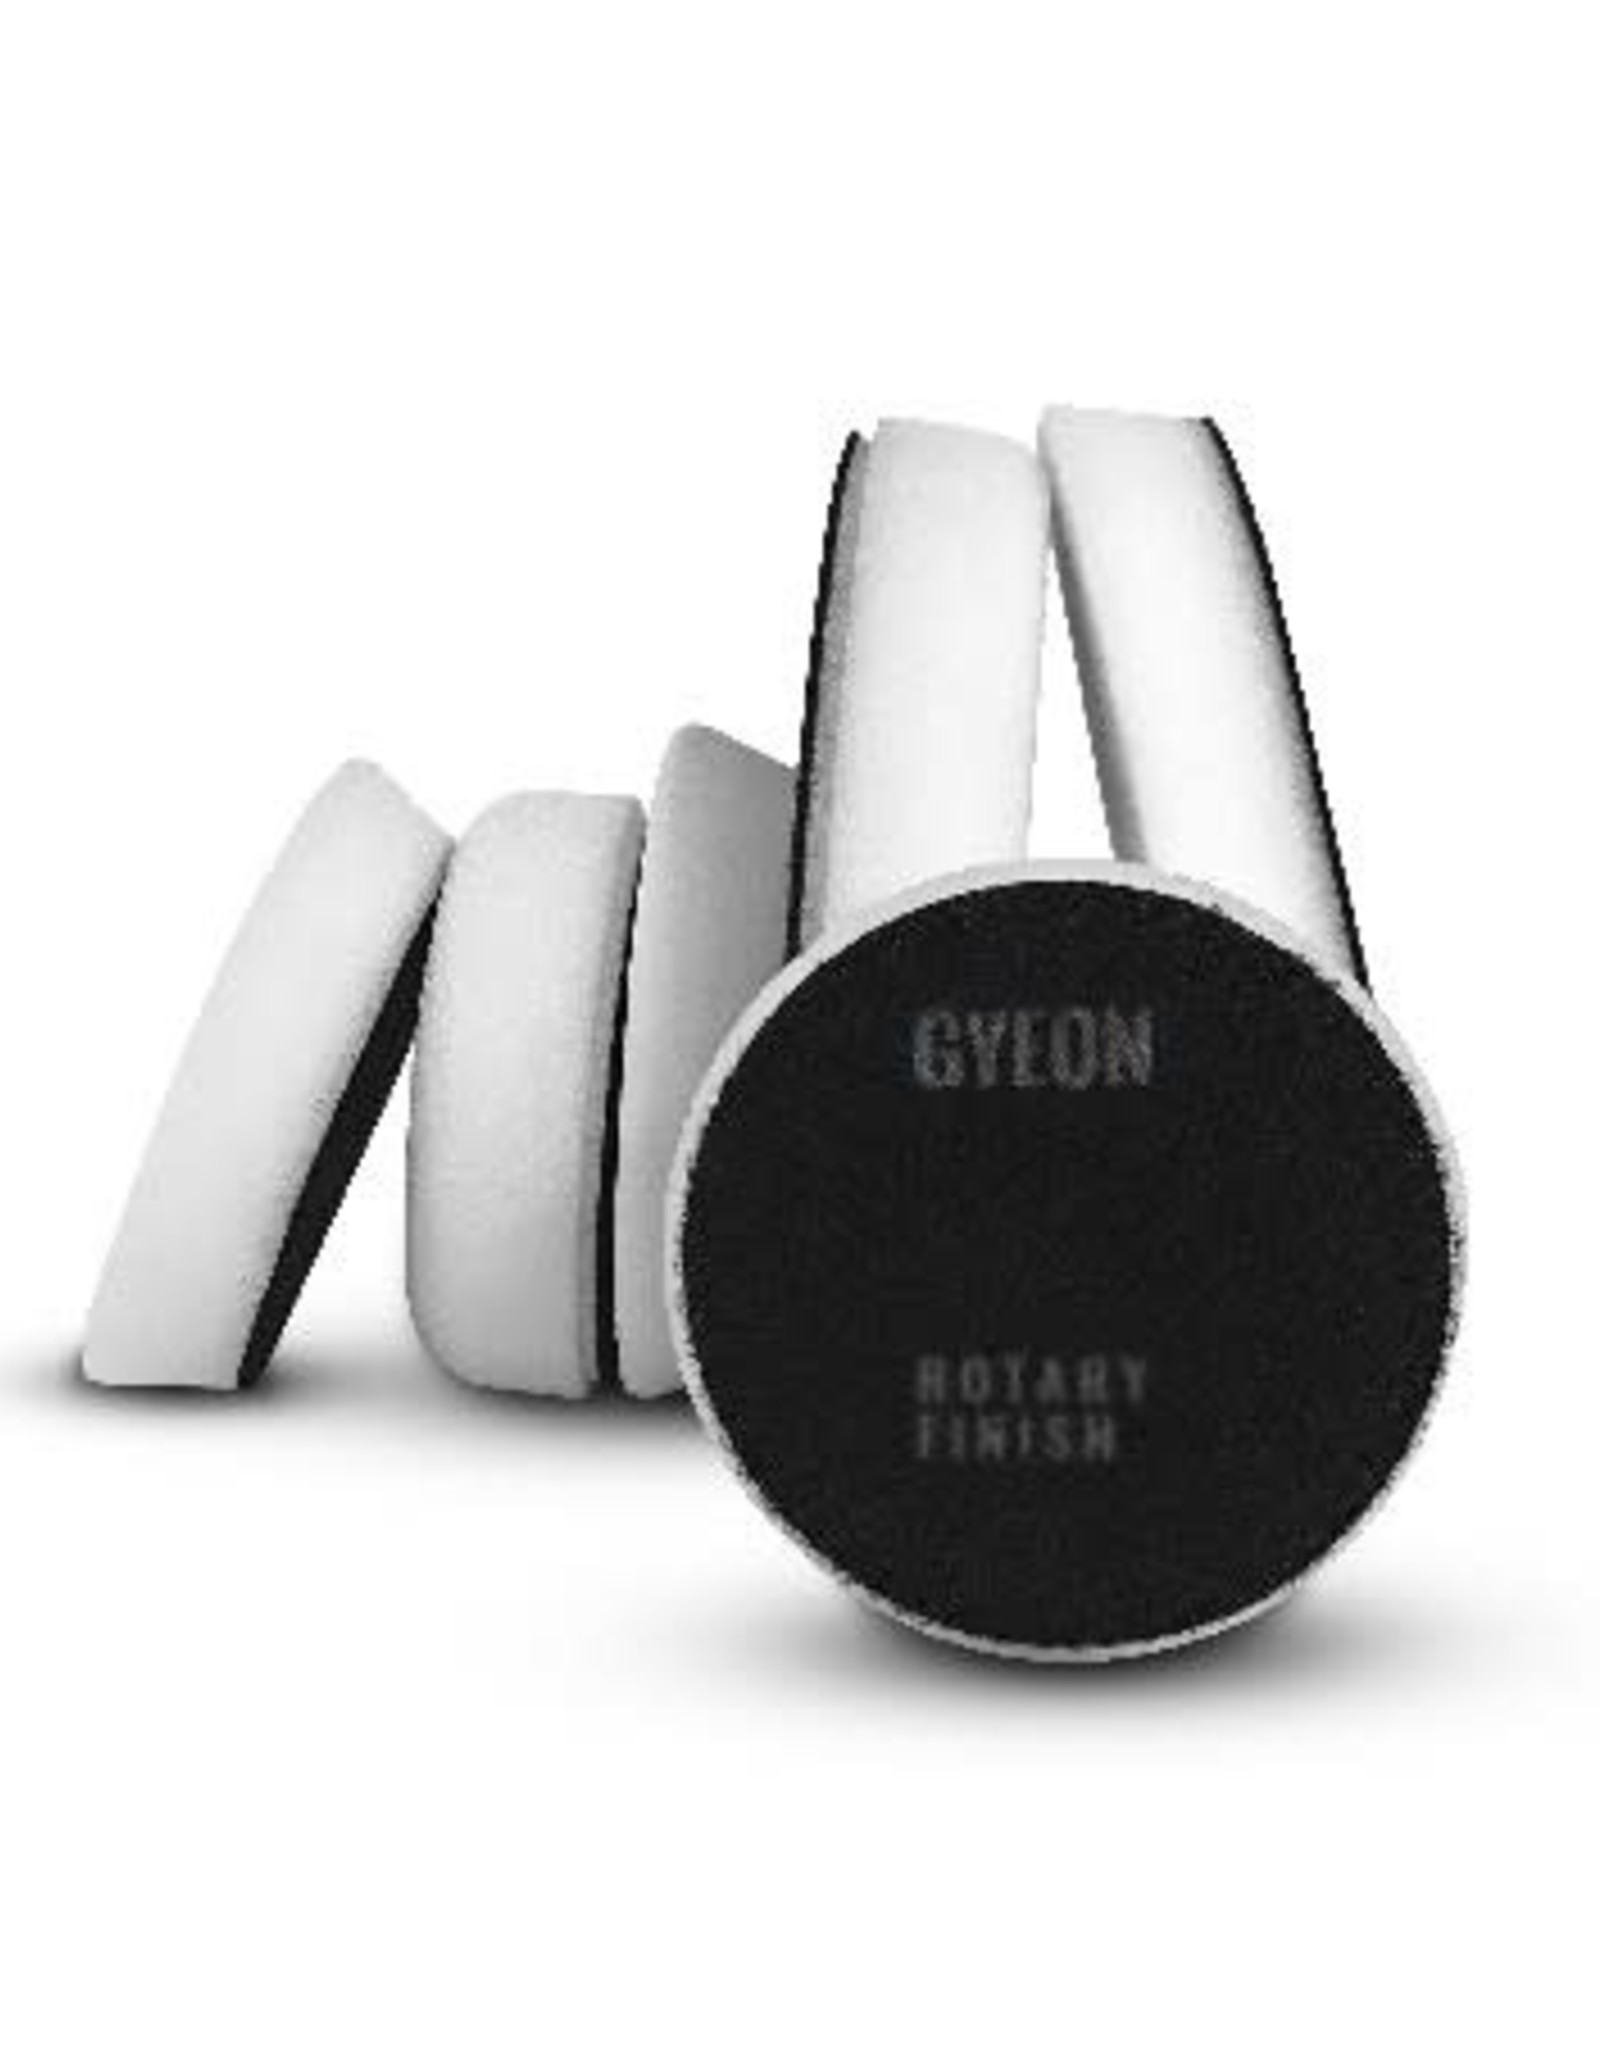 Gyeon Gyeon Q²M Rotary Finish 145mm x 25mm